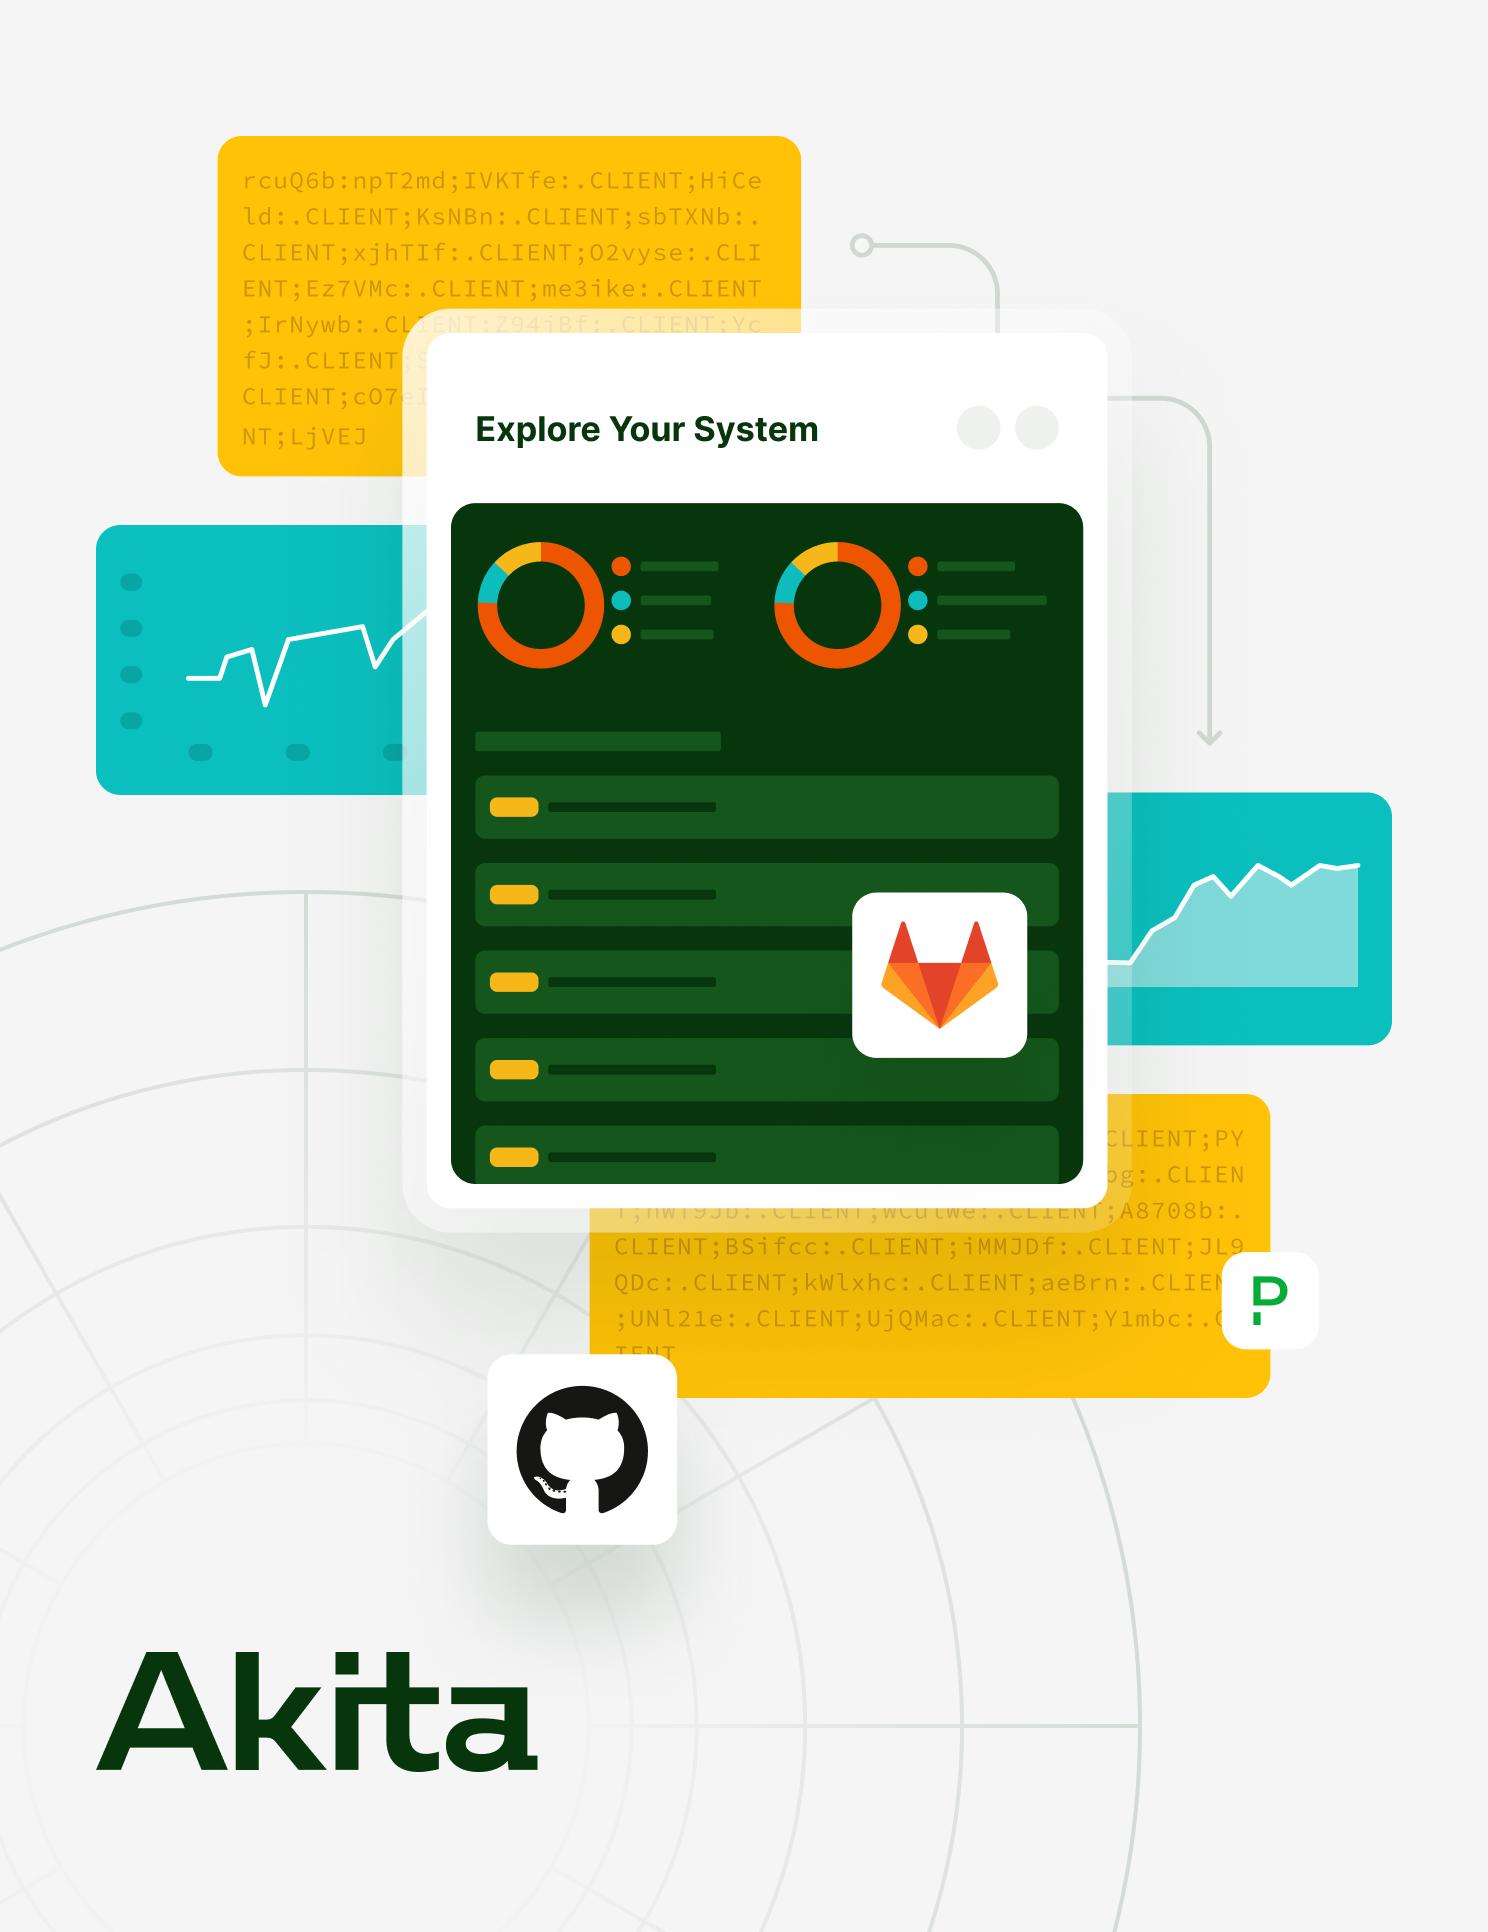 Akita illustration designed by Zypsy